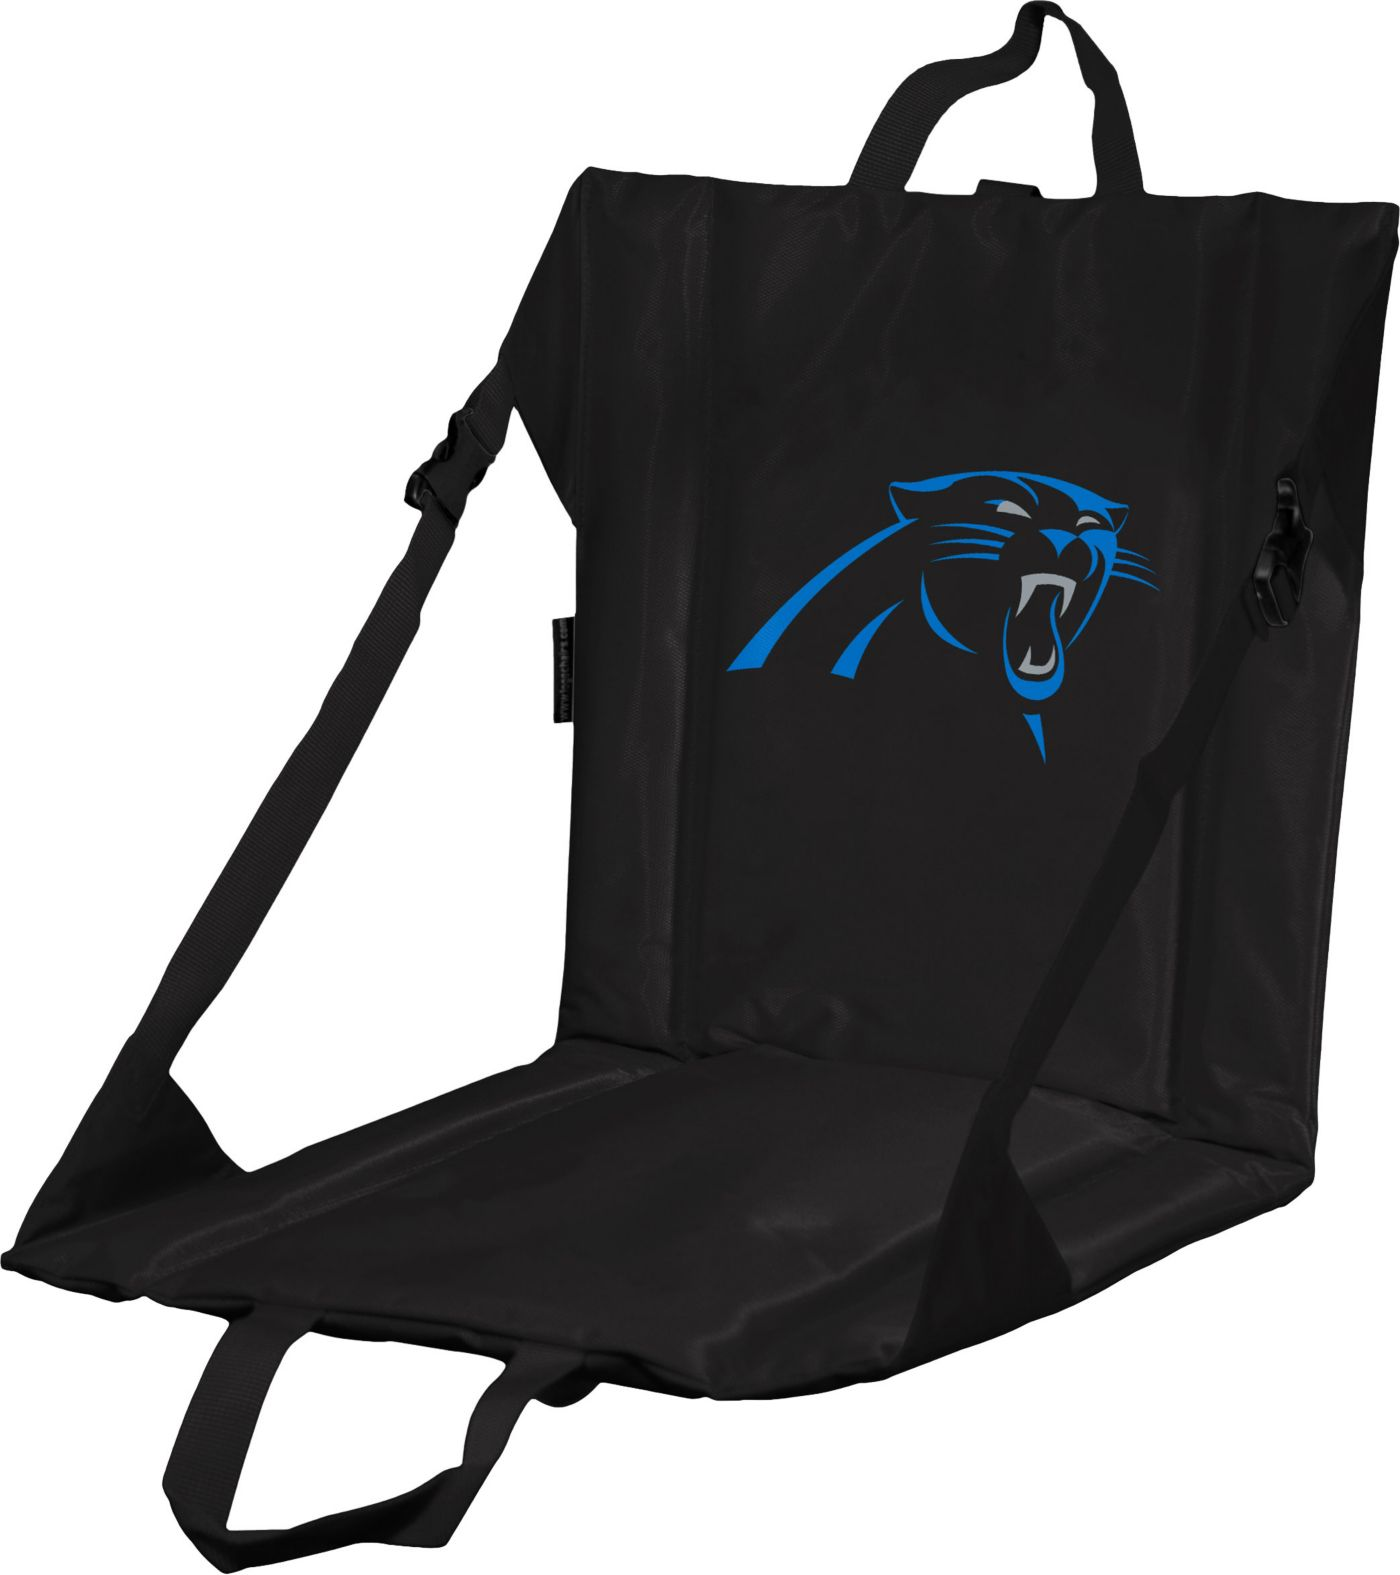 Carolina Panthers Stadium Seat